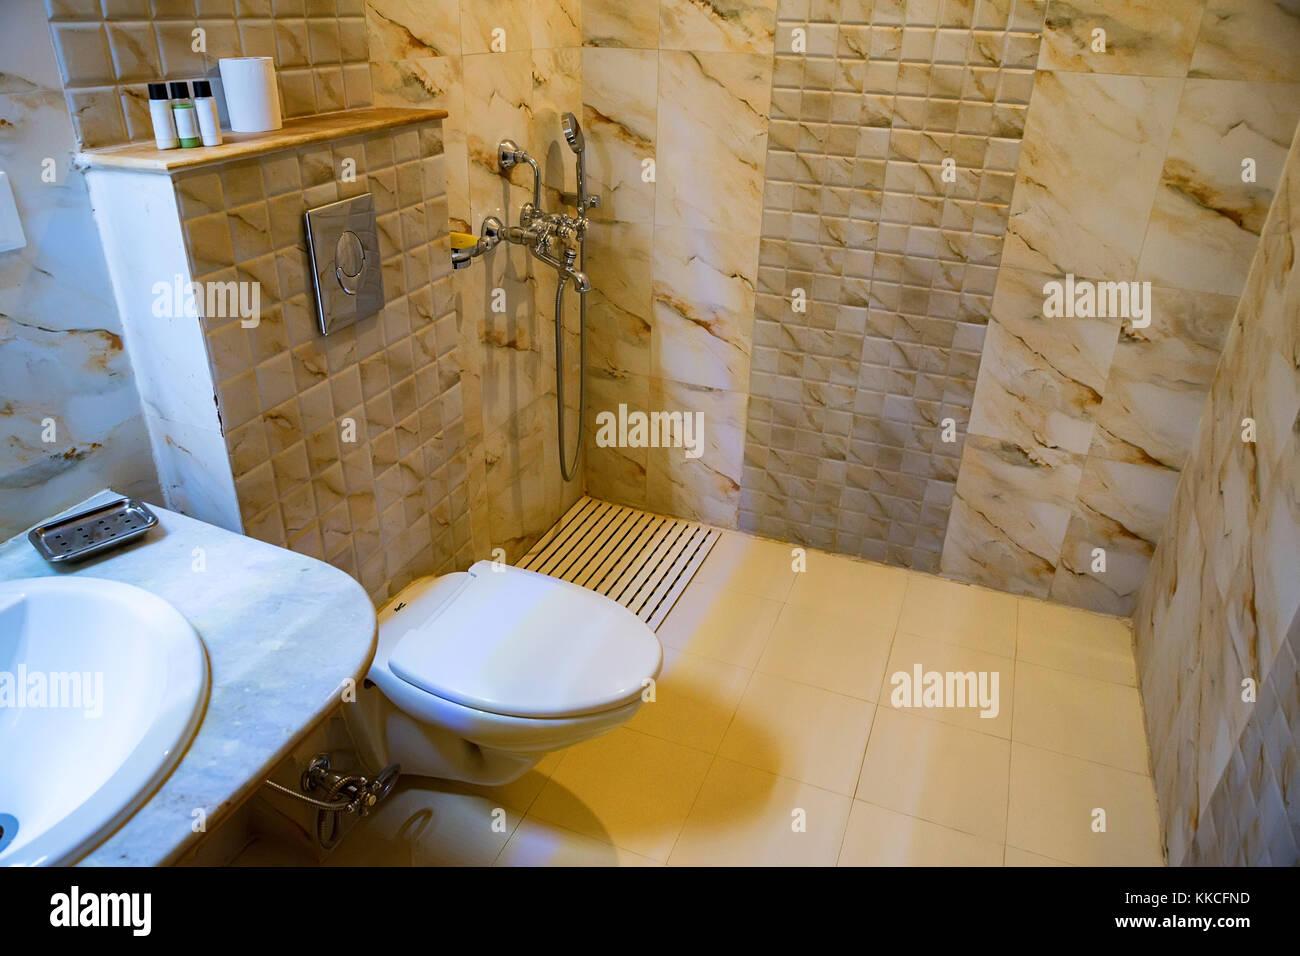 toilet water stockfotos toilet water bilder alamy. Black Bedroom Furniture Sets. Home Design Ideas